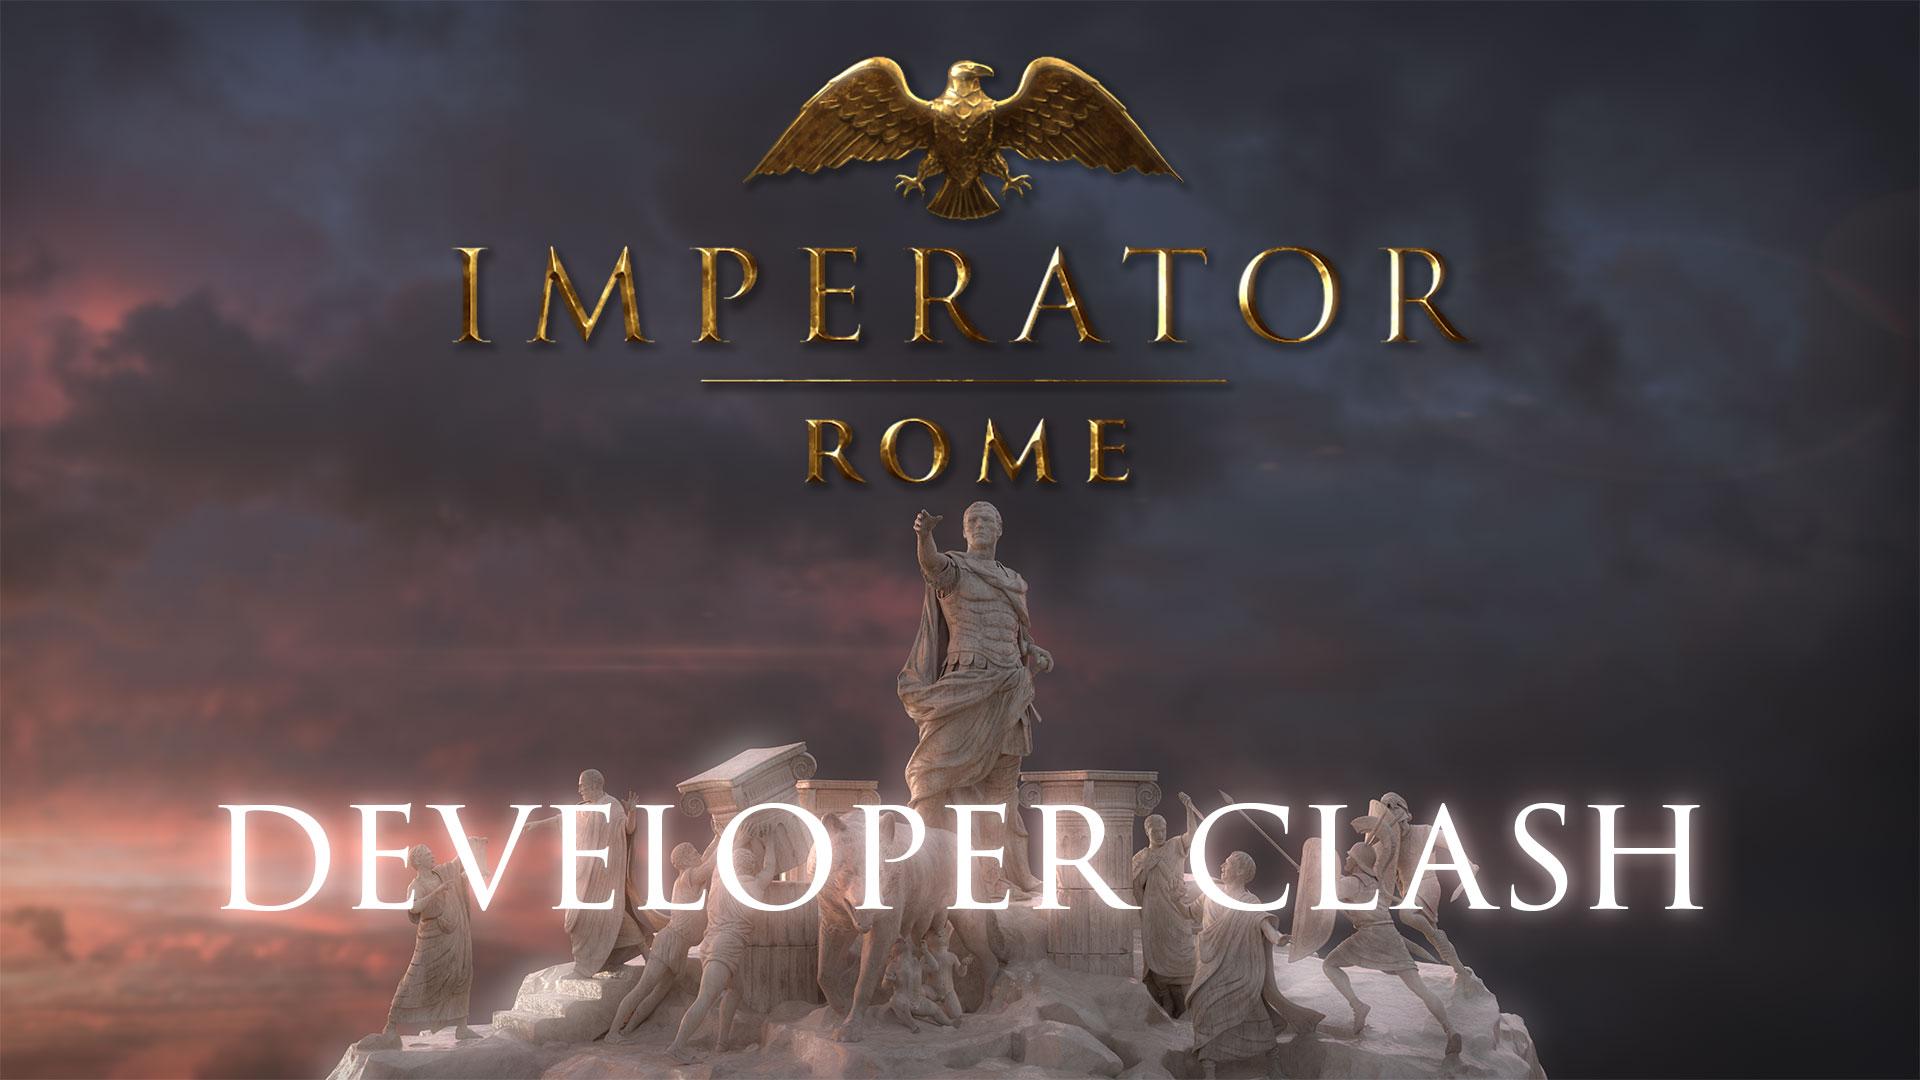 imperator-devclash-jpg.449739